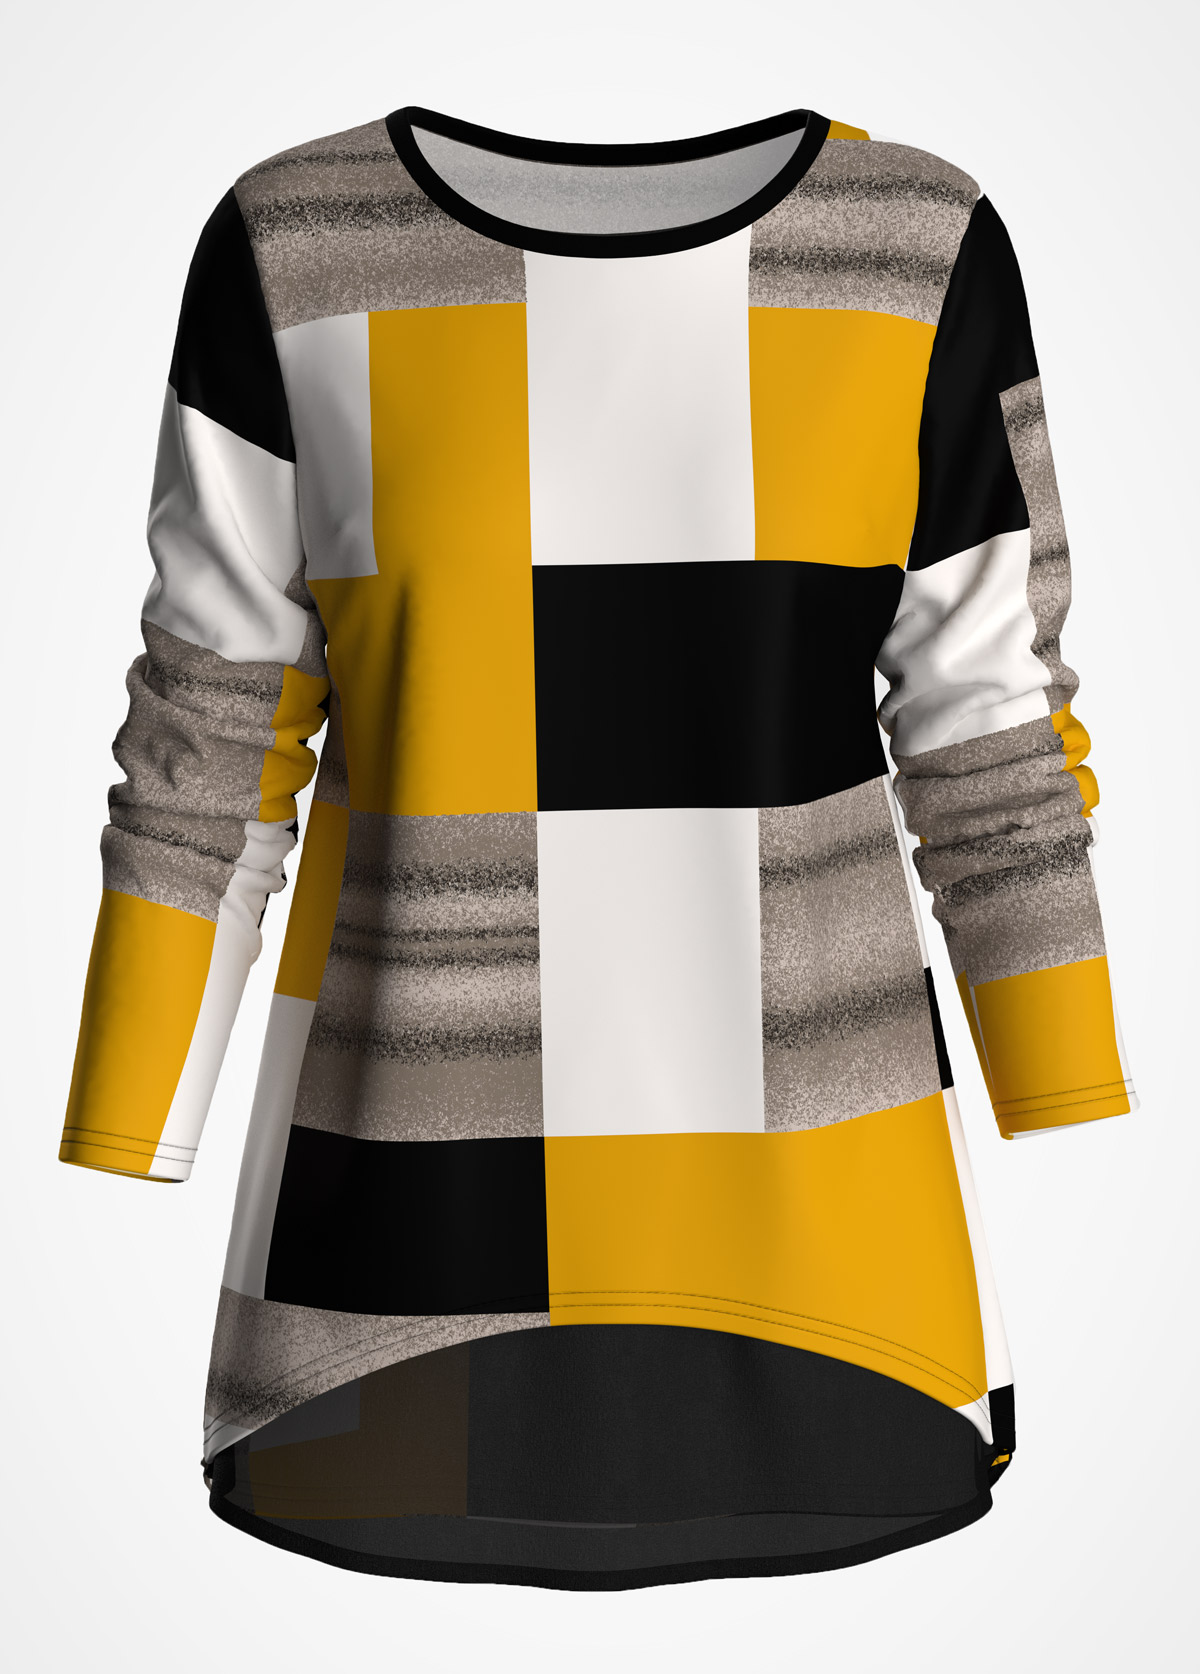 ROTITA Chiffon Panel Long Sleeve Geometric Print T Shirt